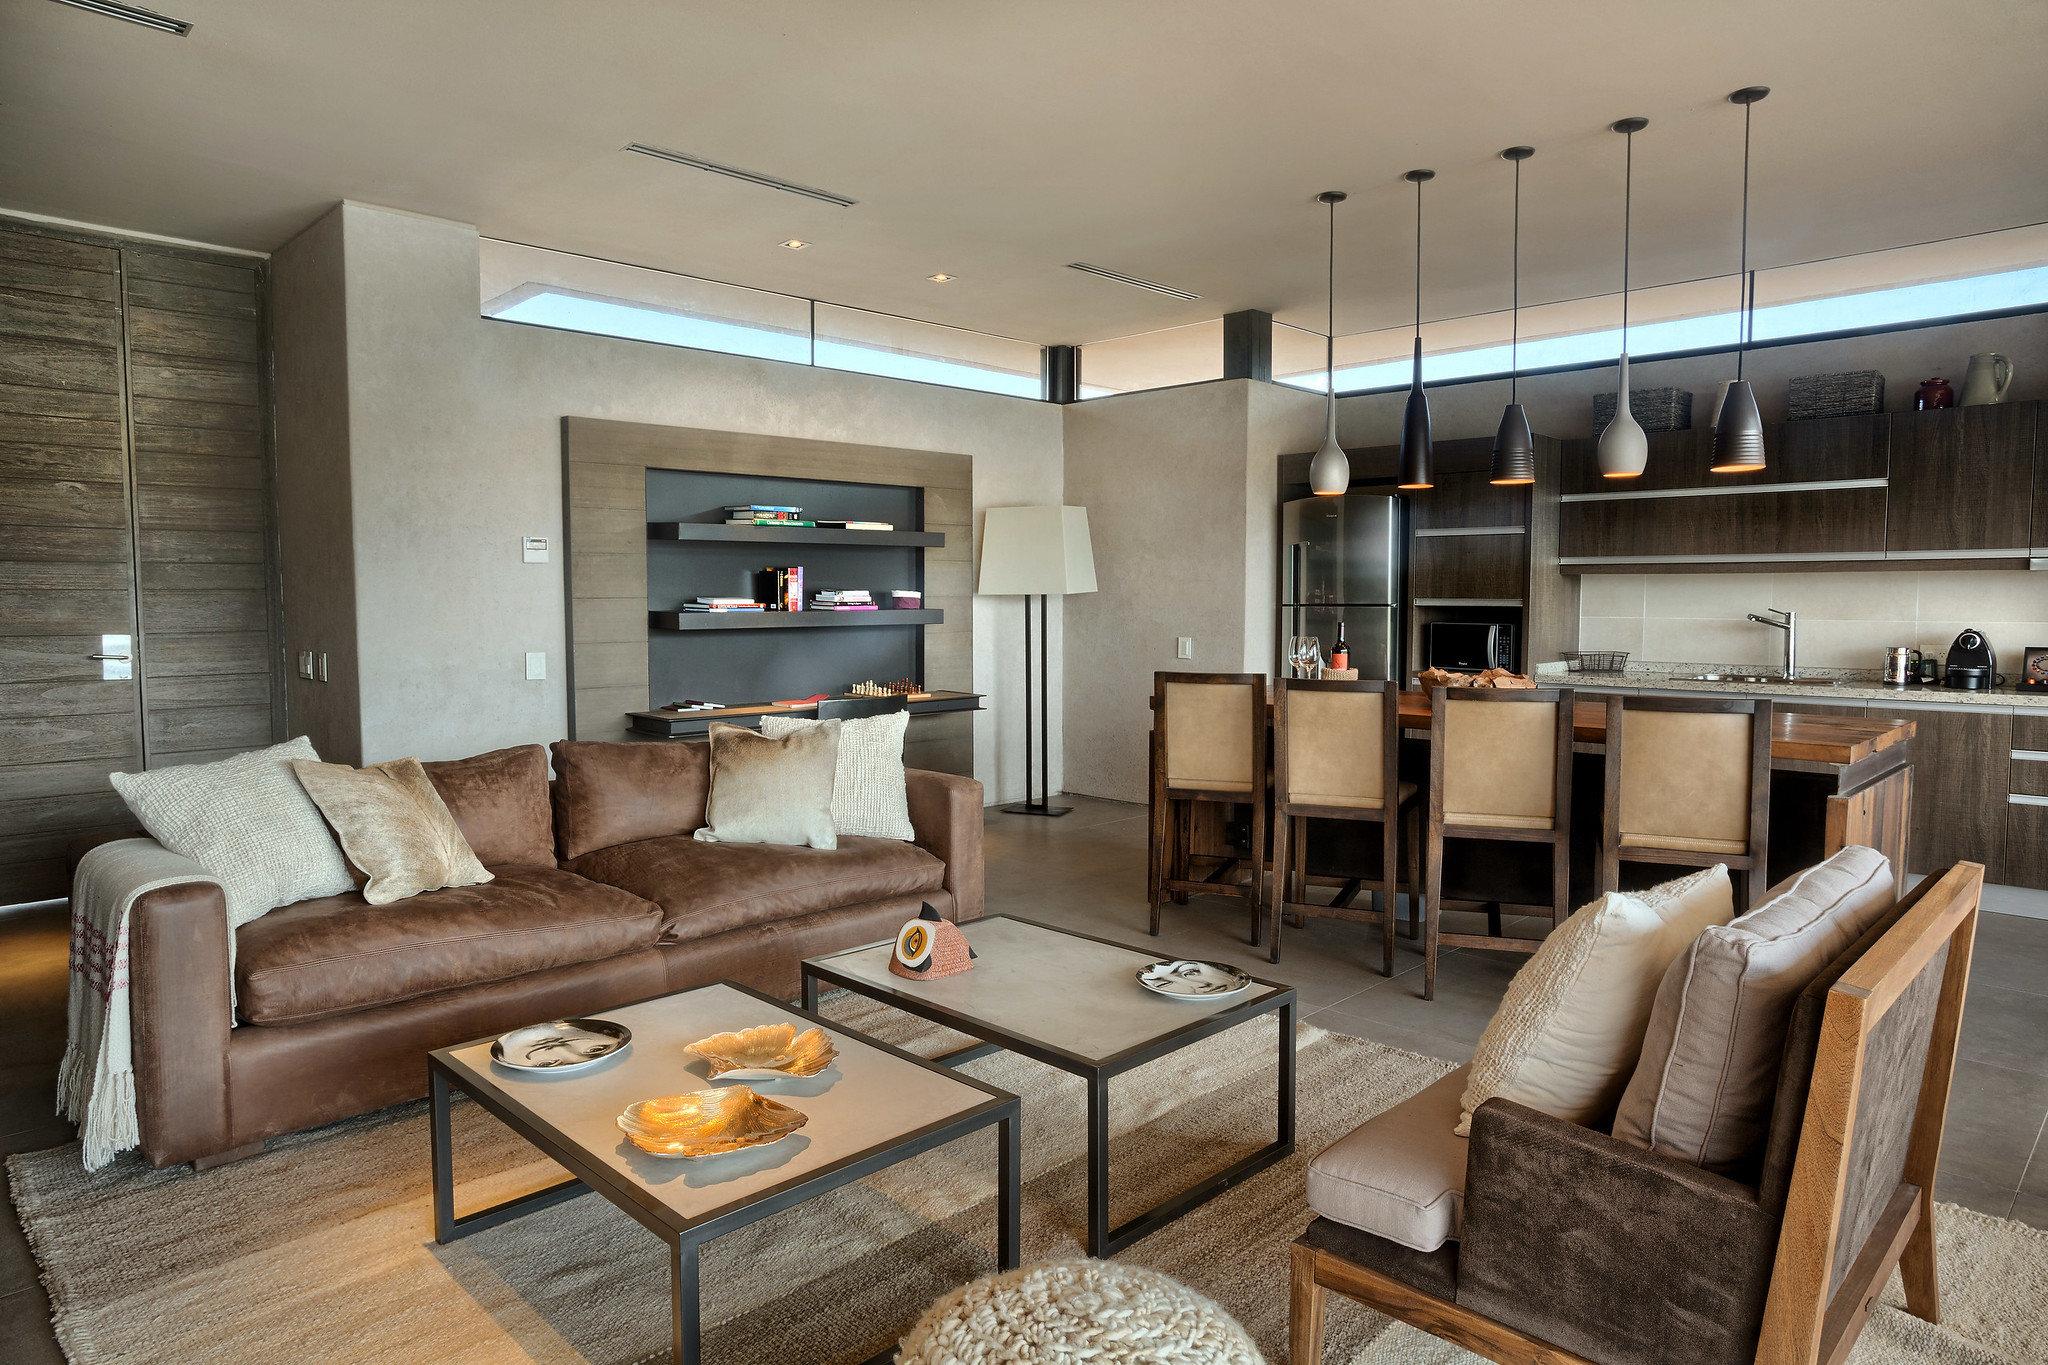 Food + Drink Hotels indoor room floor Living sofa living room interior design ceiling real estate furniture interior designer loft apartment leather area